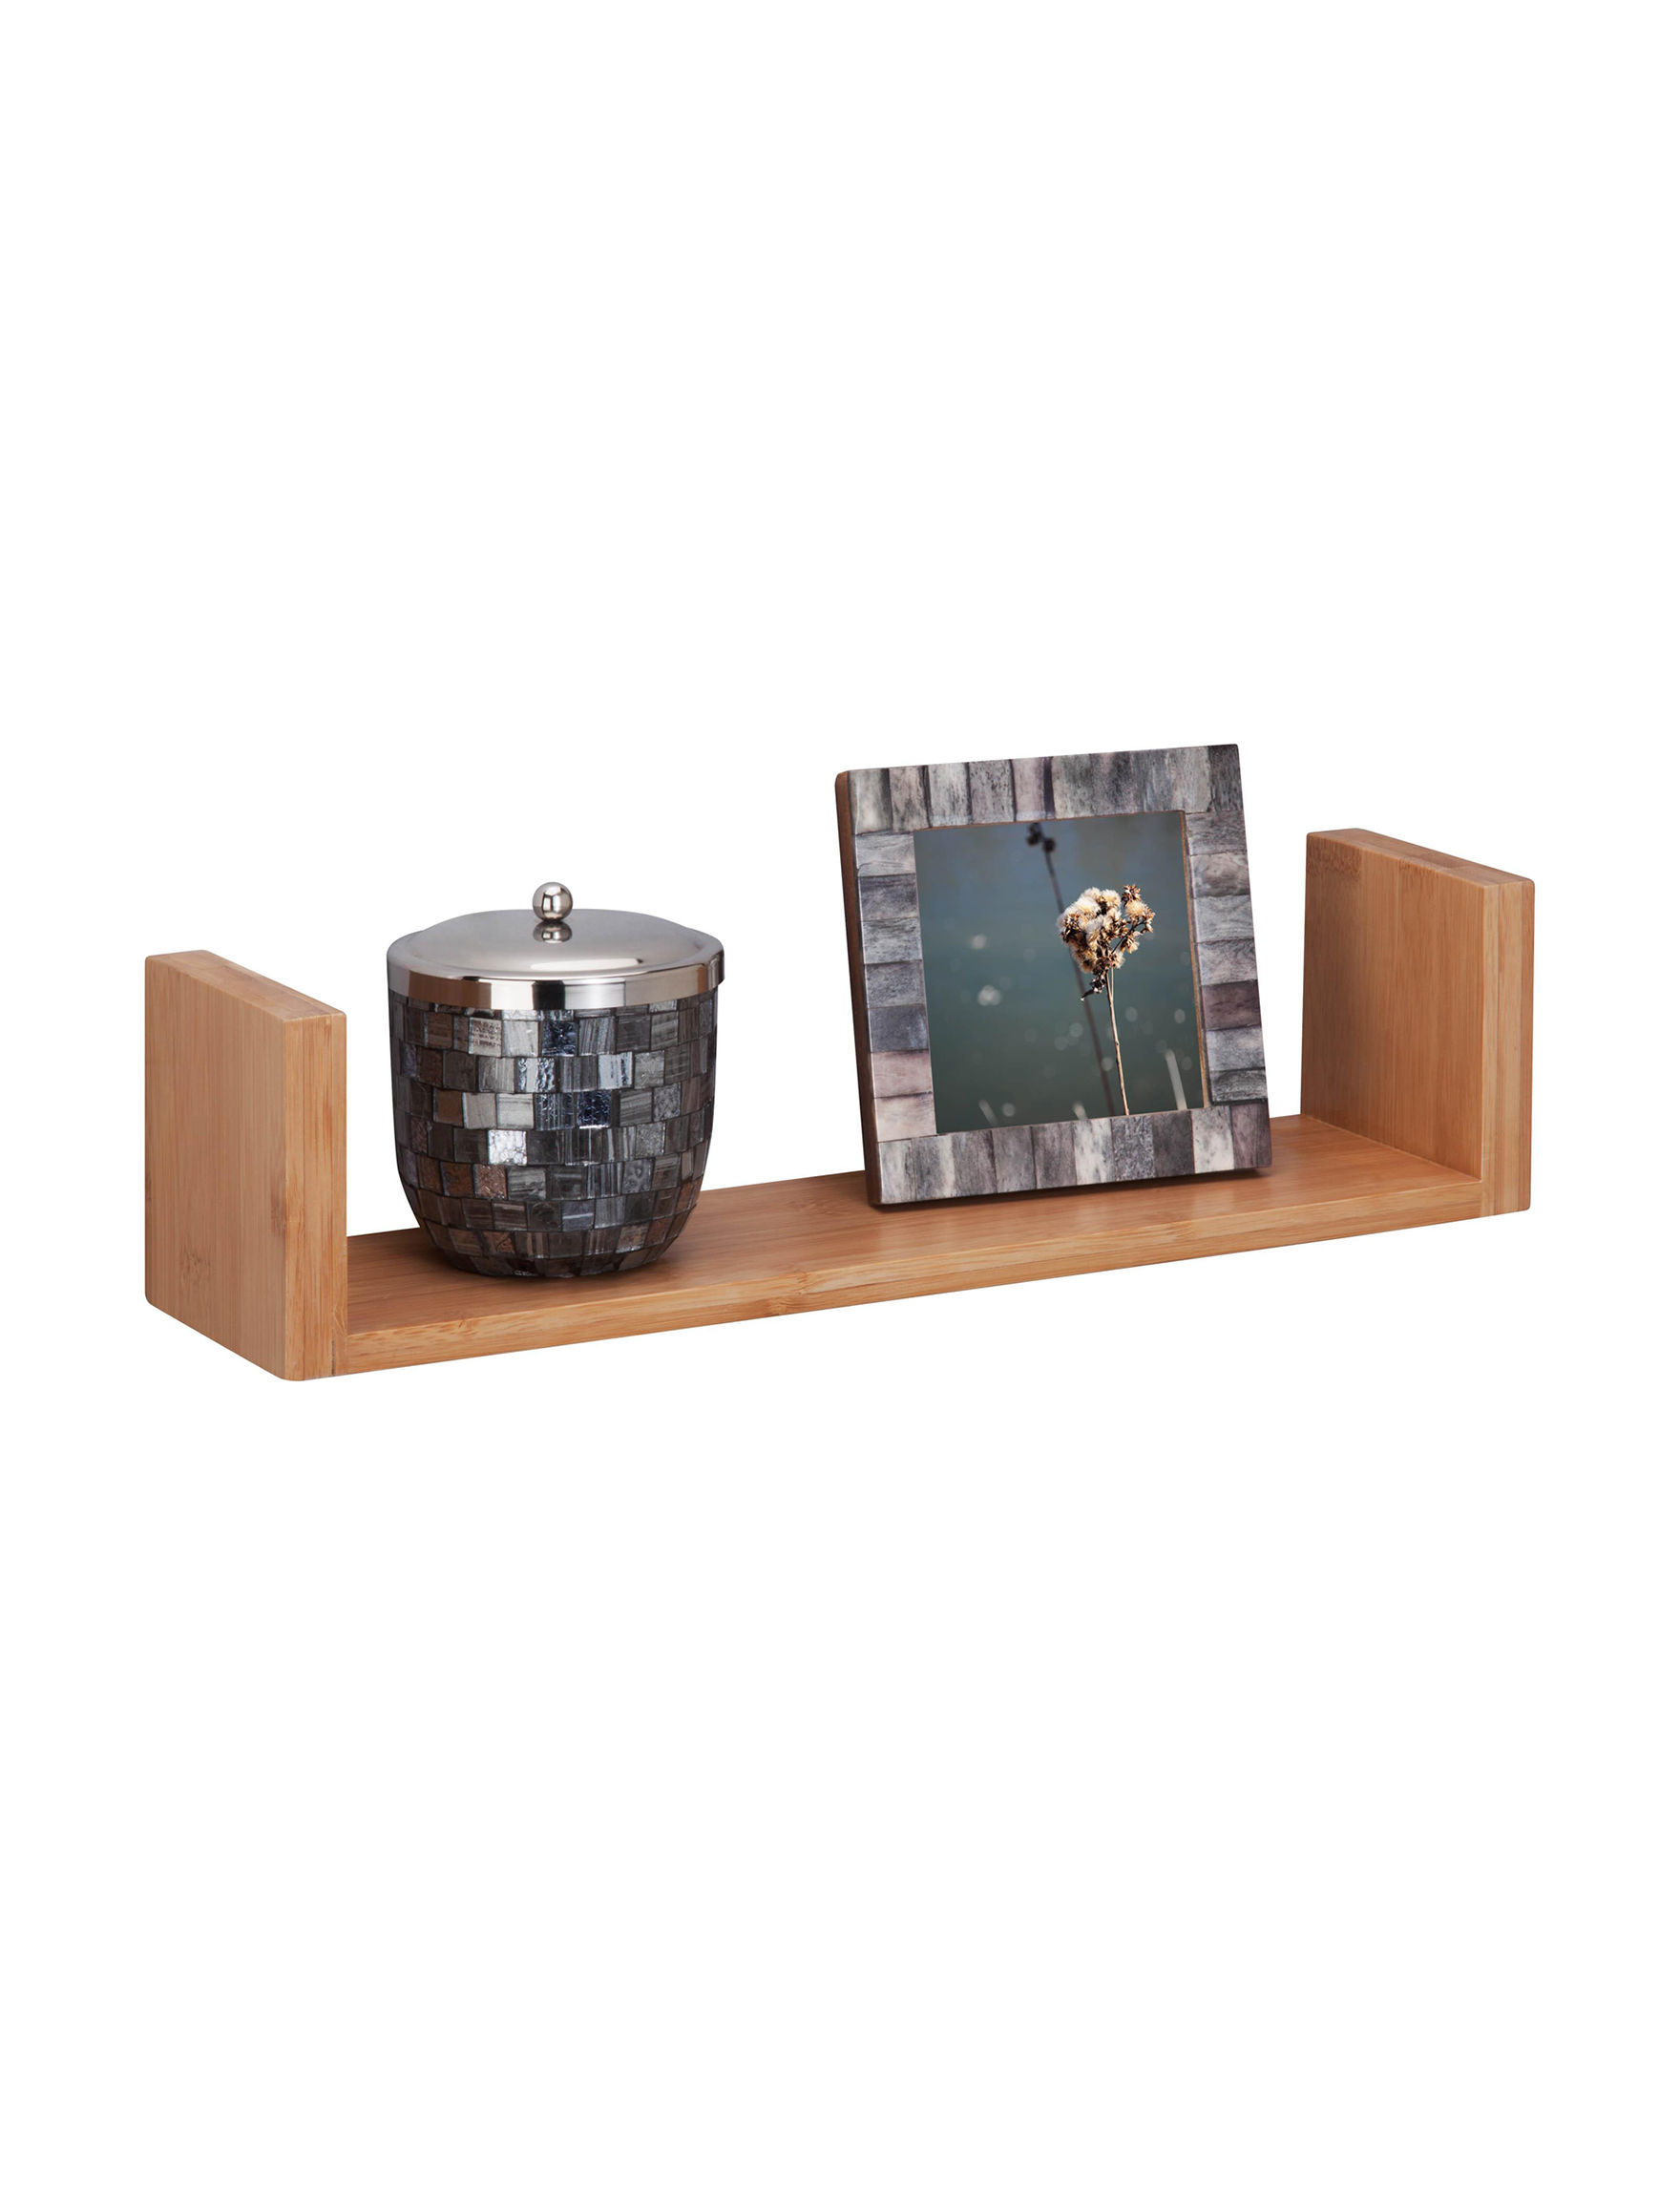 Honey-Can-Do International Natural Storage Shelves Storage & Organization